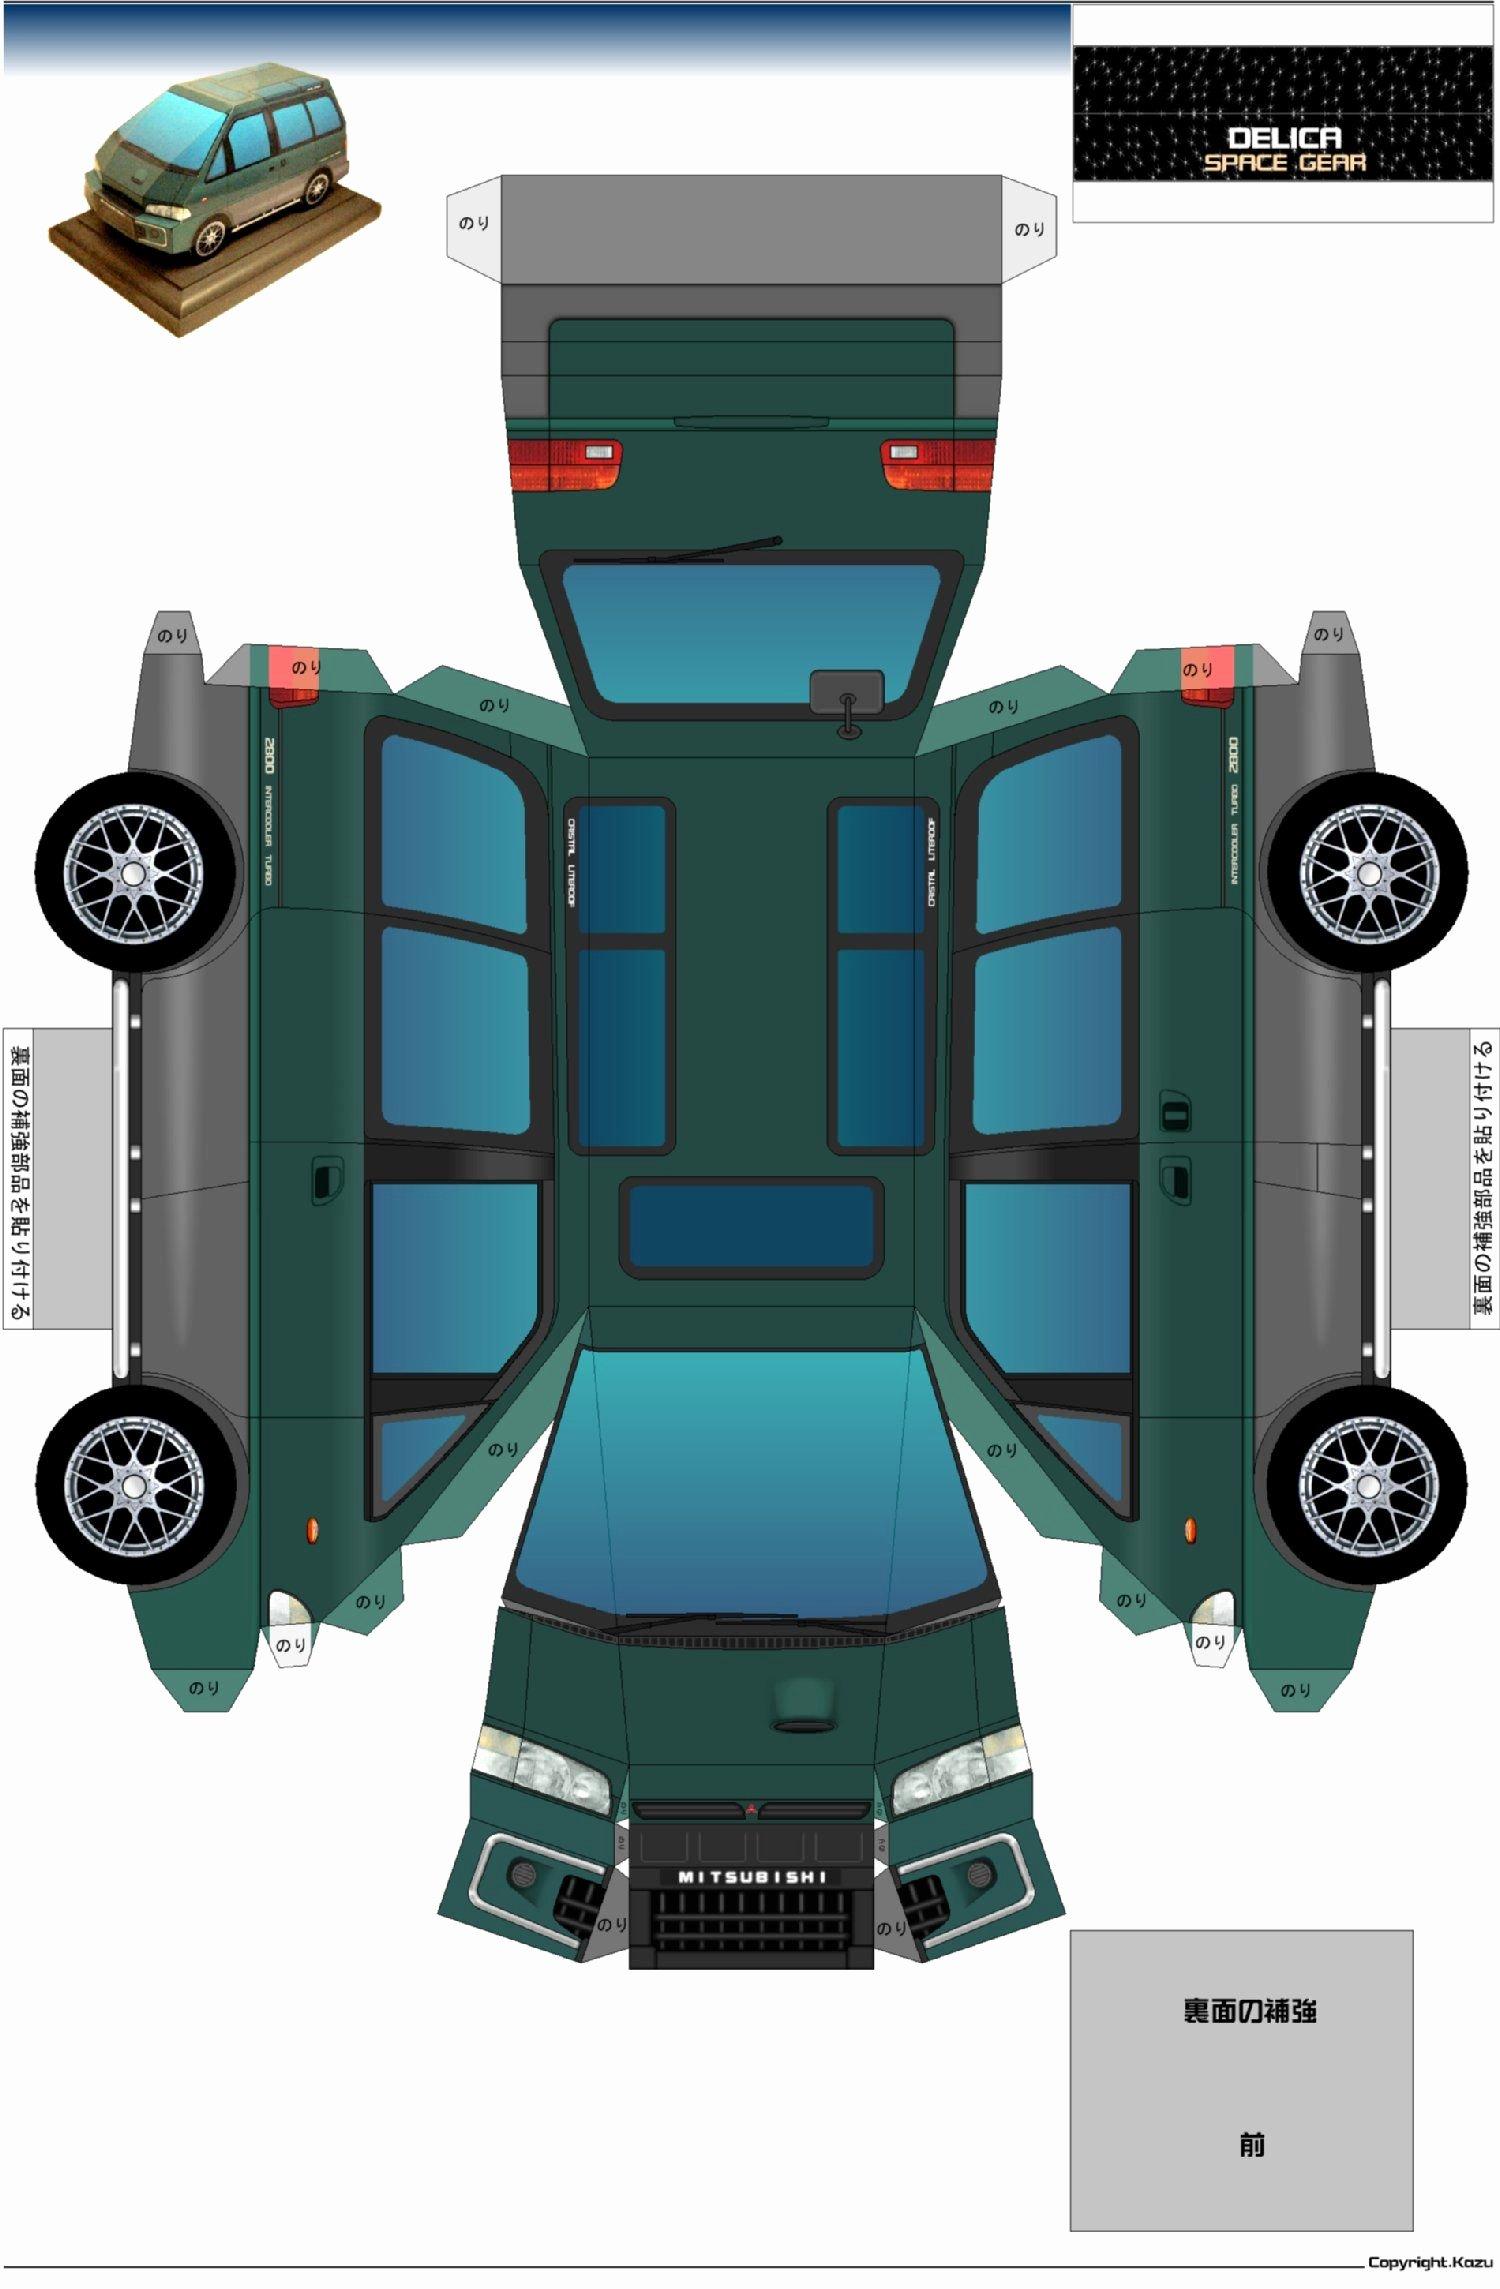 How to Make Paper Car Elegant Printable Car Paper Model Templates Paper Models